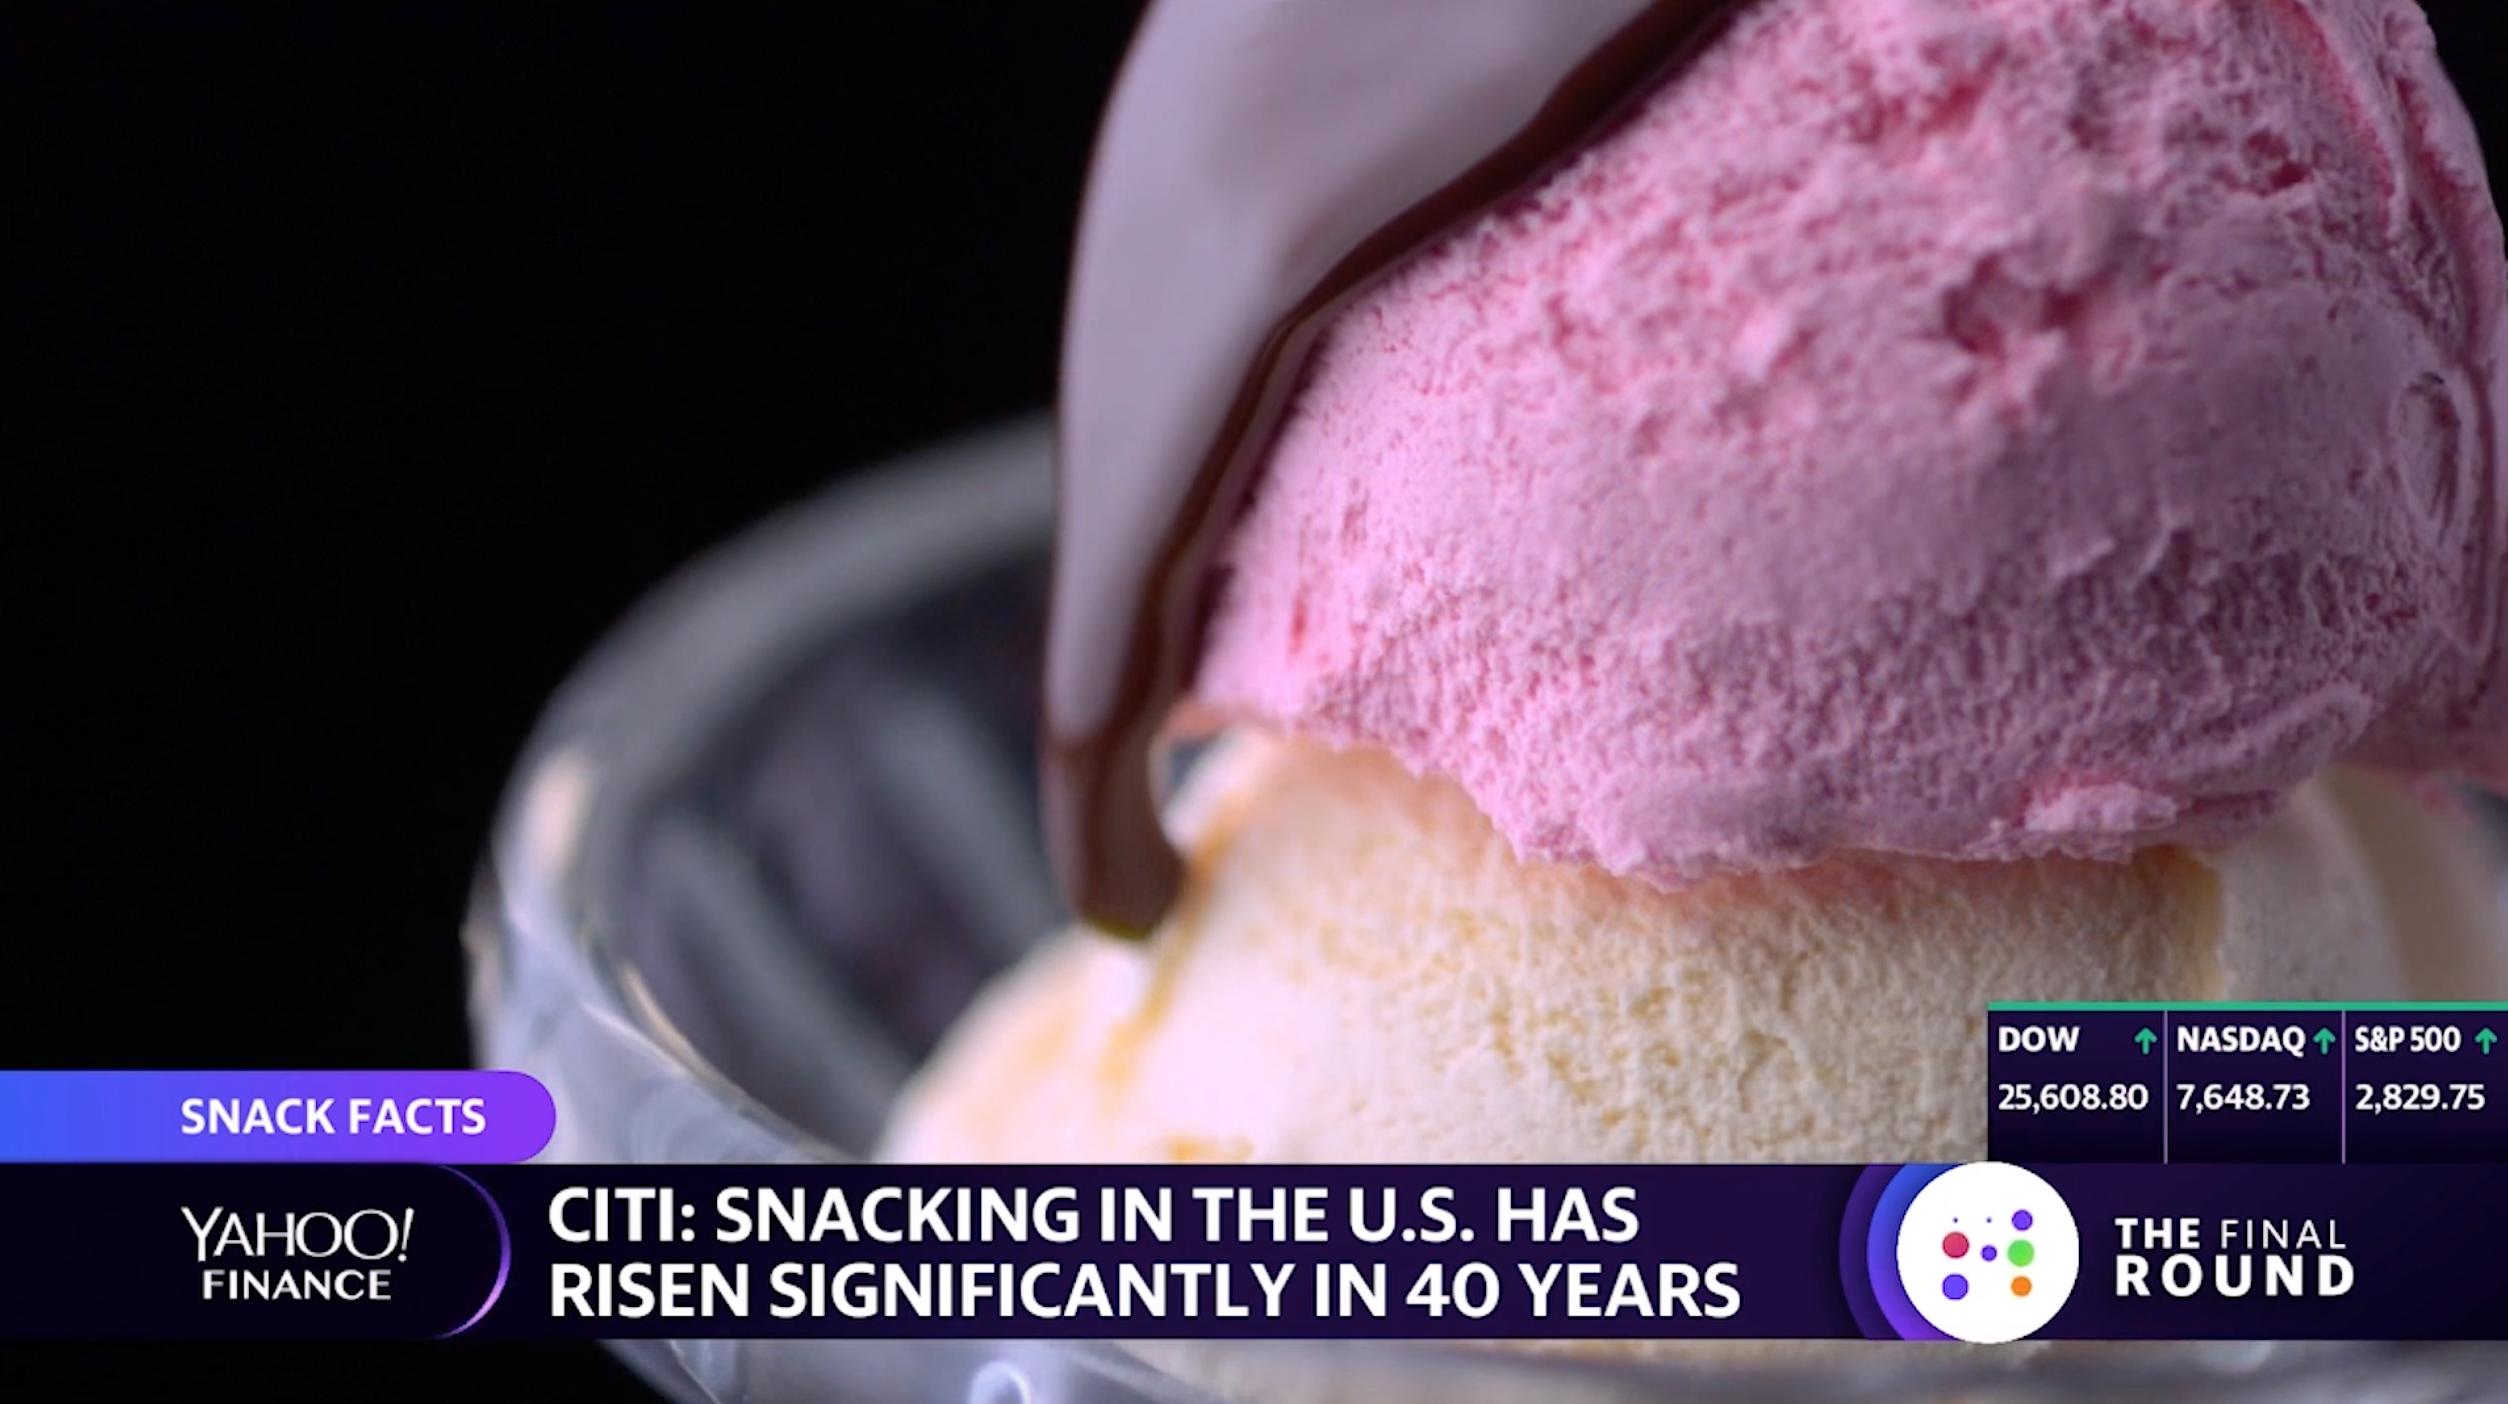 The global snack market is worth $605 billion